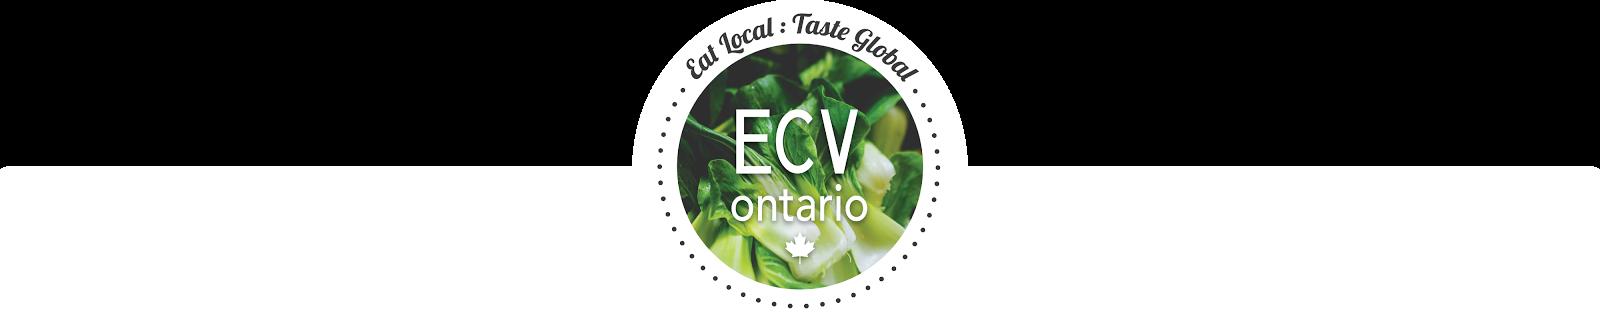 ECV Ontario